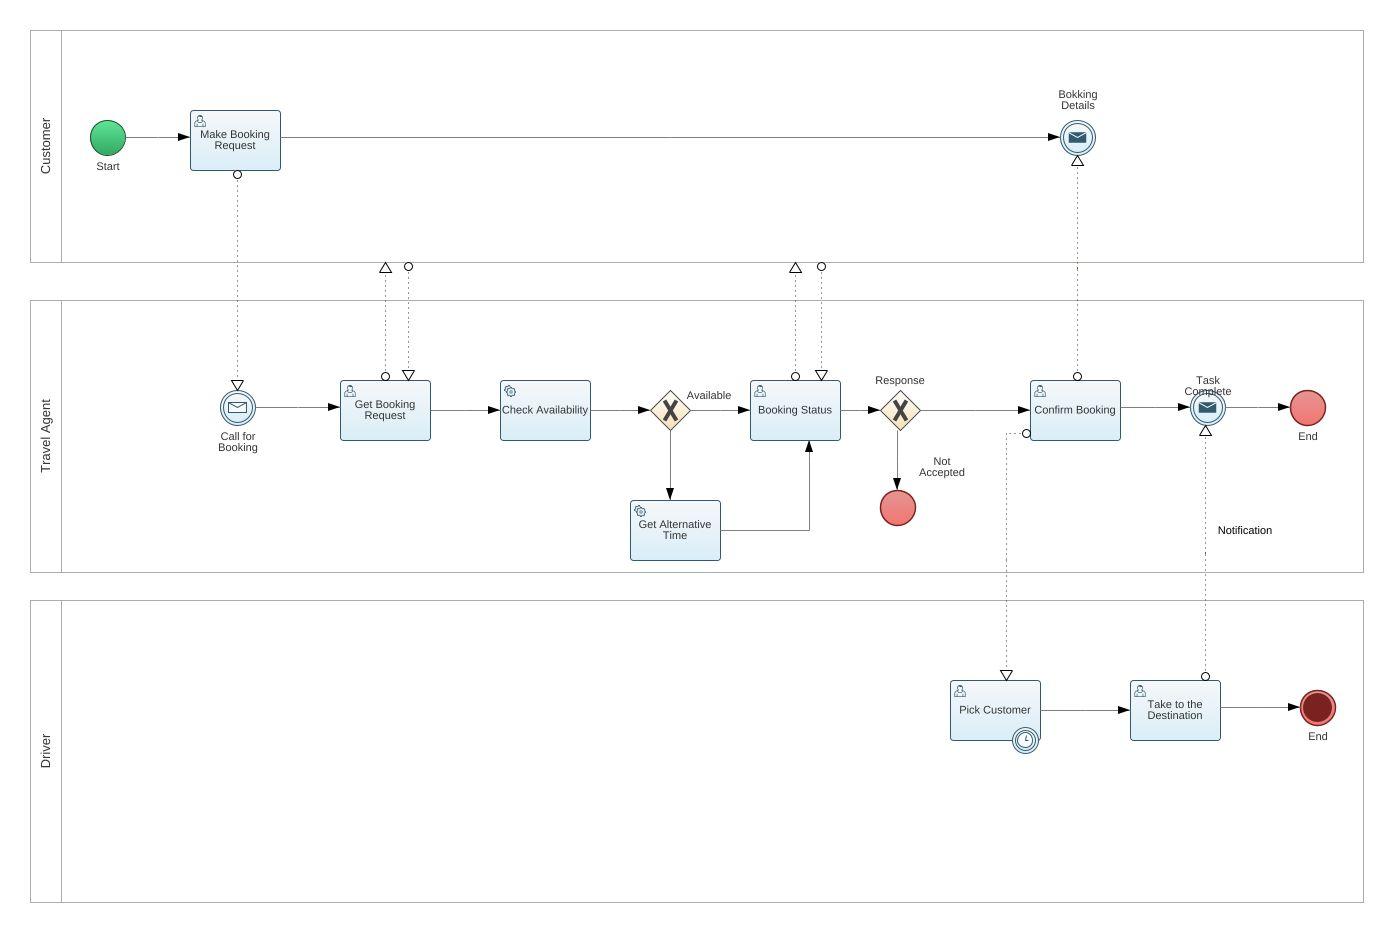 Cab booking bpmn2 diagram cab booking bpmn2 example bpmn2 cab jpeg png svg collaboration diagram pooptronica Choice Image